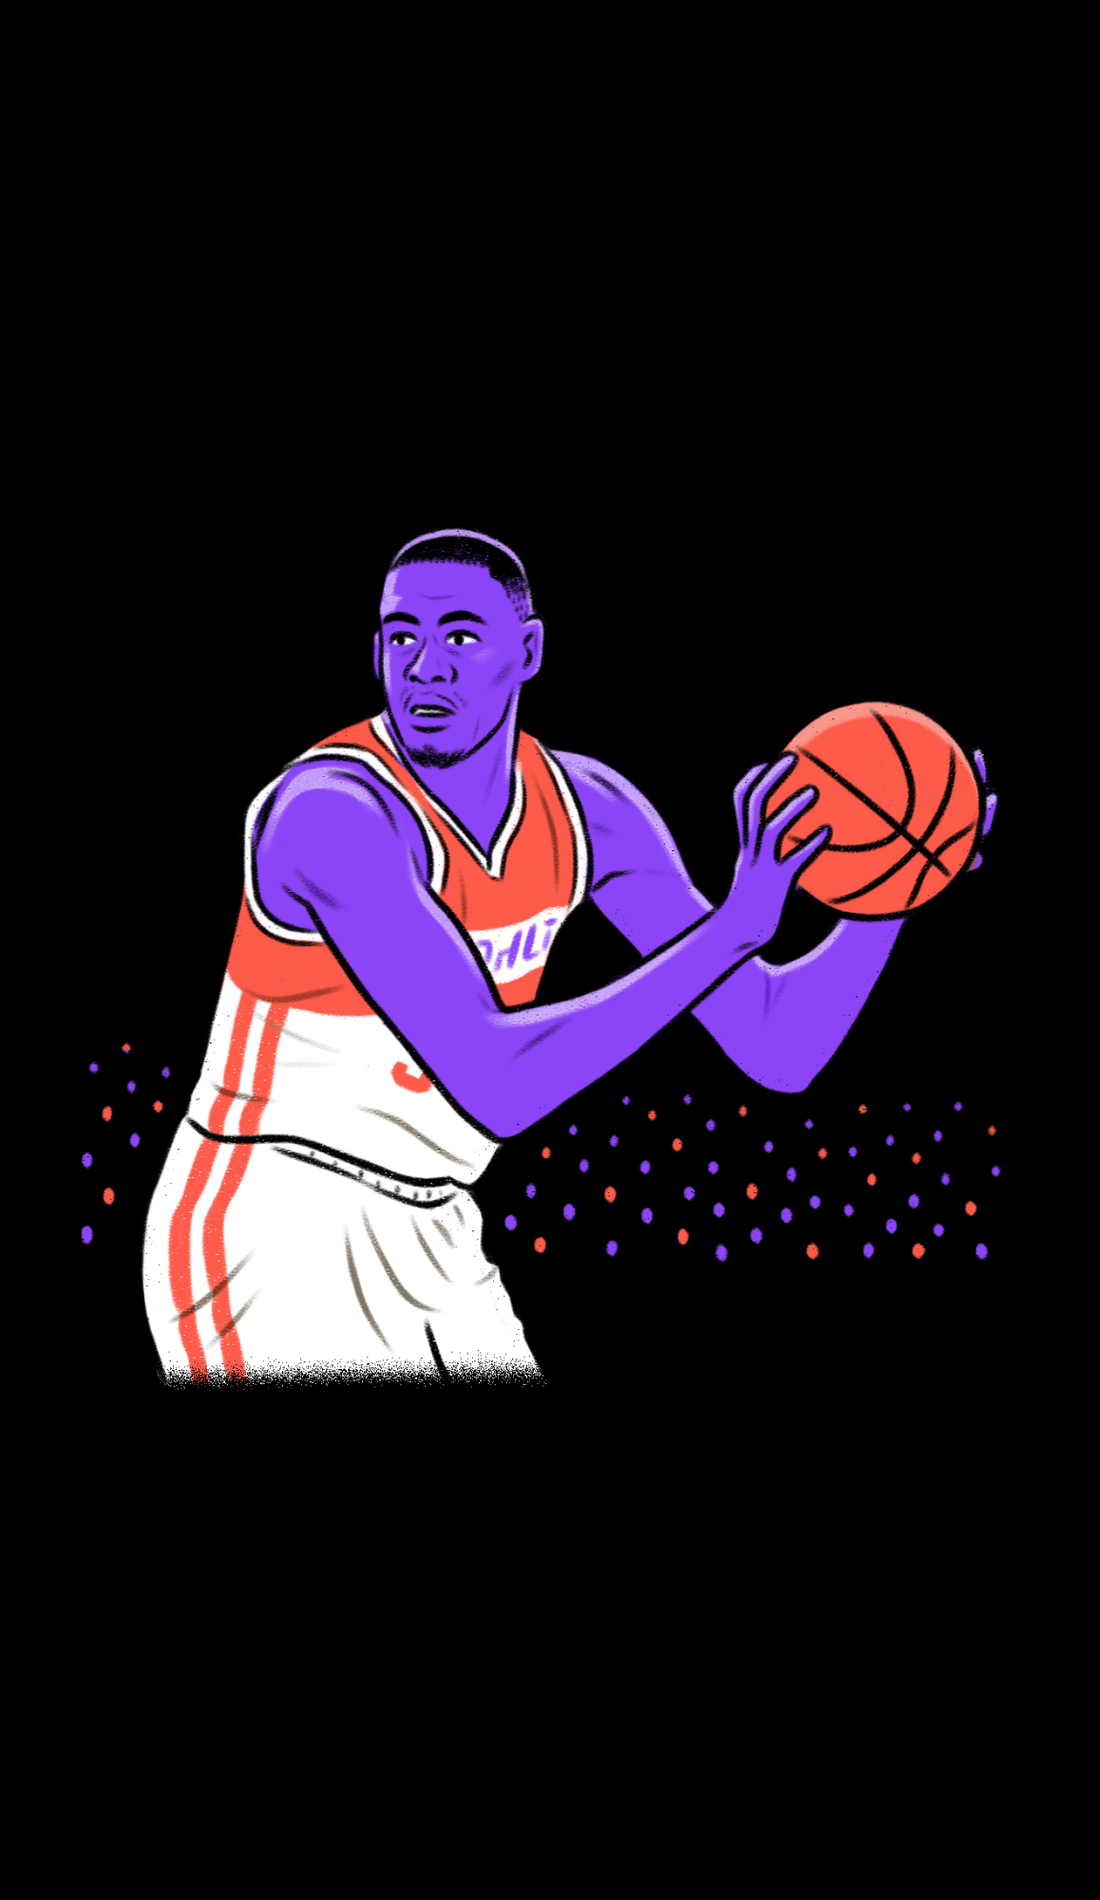 A Washington State Cougars Basketball live event